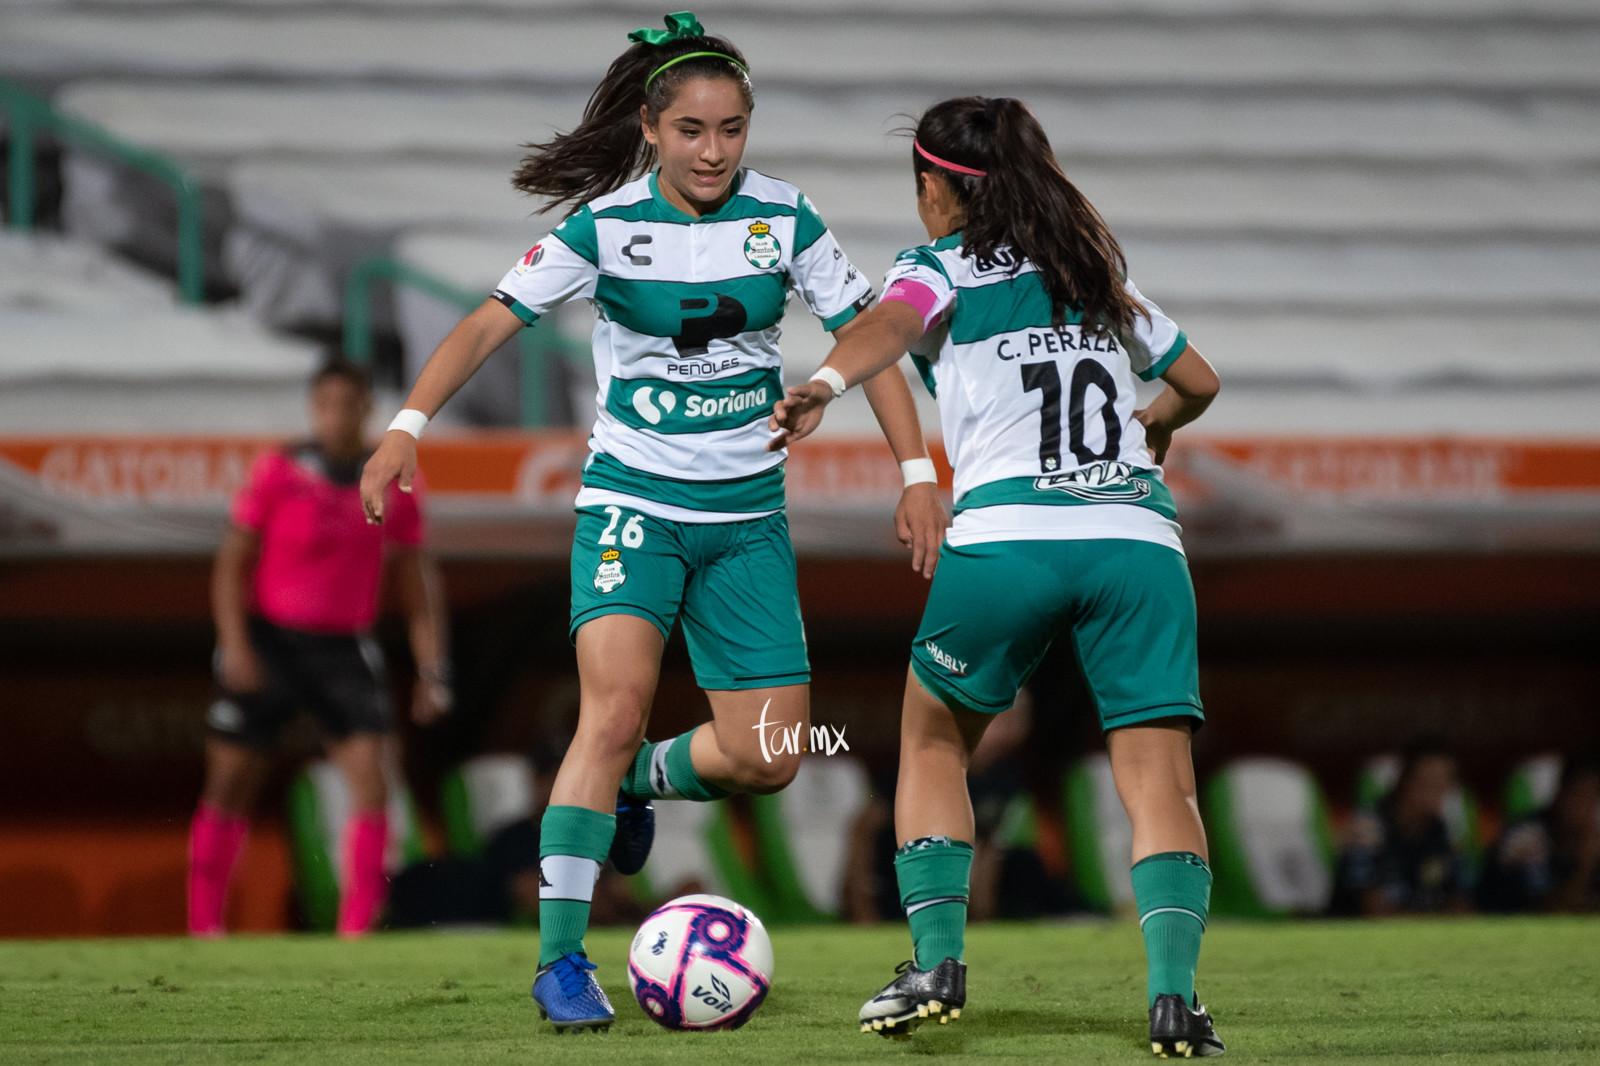 Cinthya Peraza, Ashly Martínez